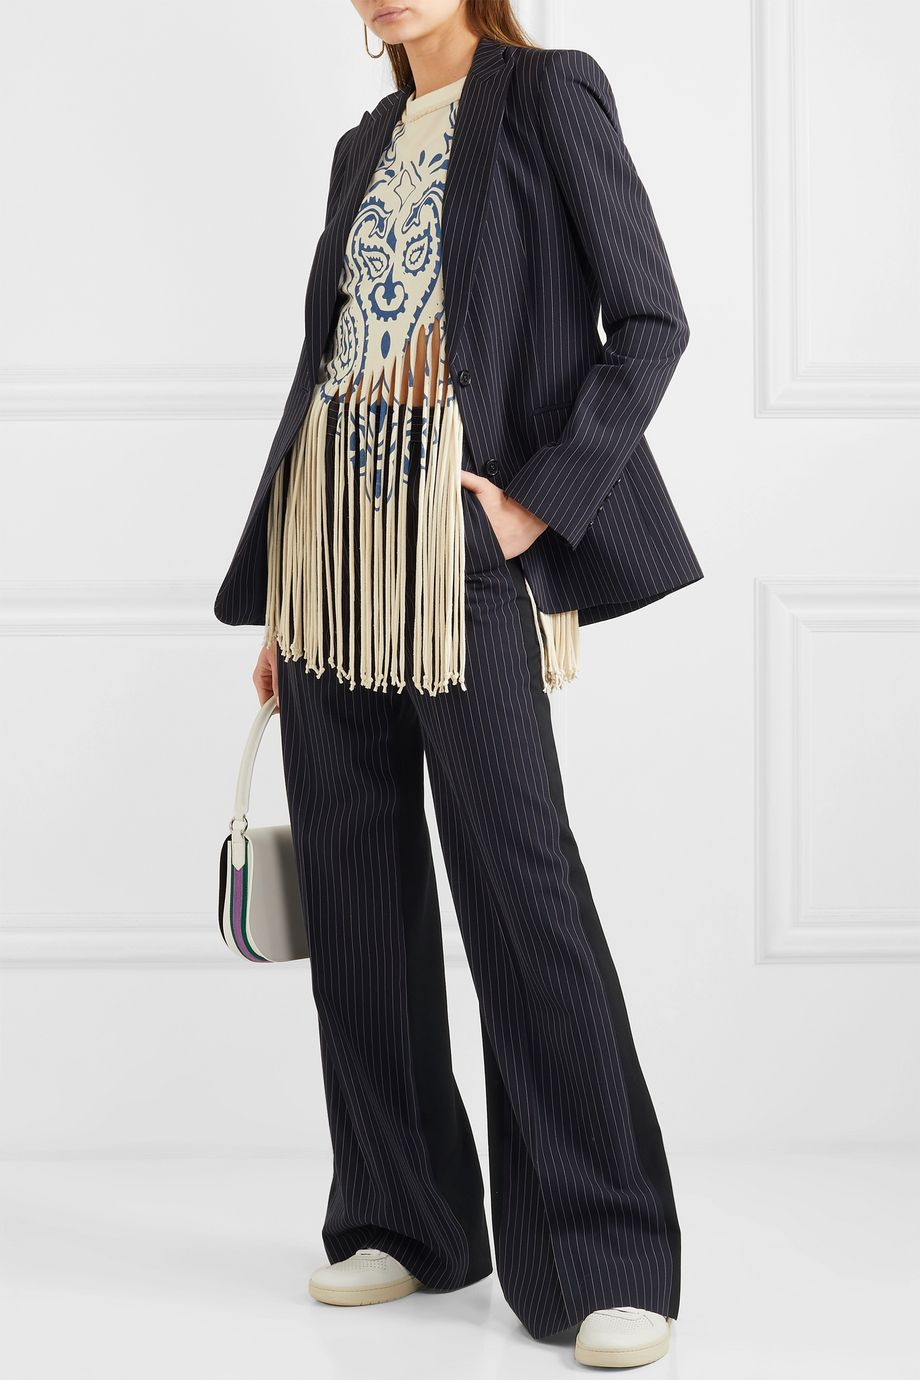 Stella McCartney Two-tone pinstriped wool wide-leg pants